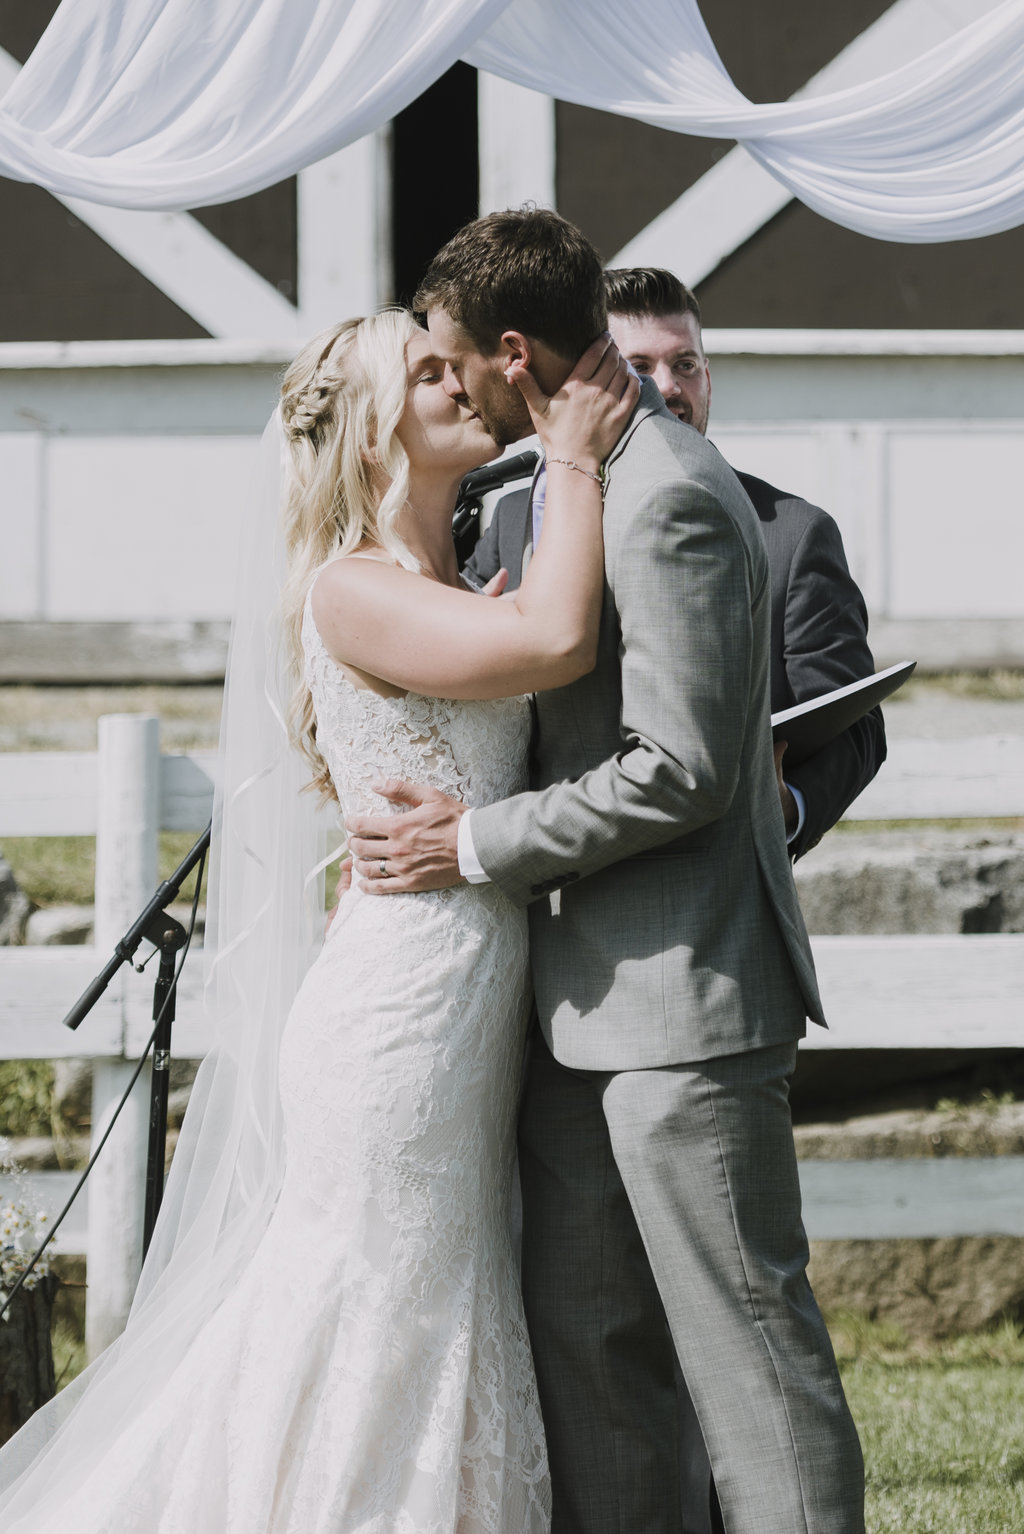 Brody&Sarah_Ceremony-184.jpg